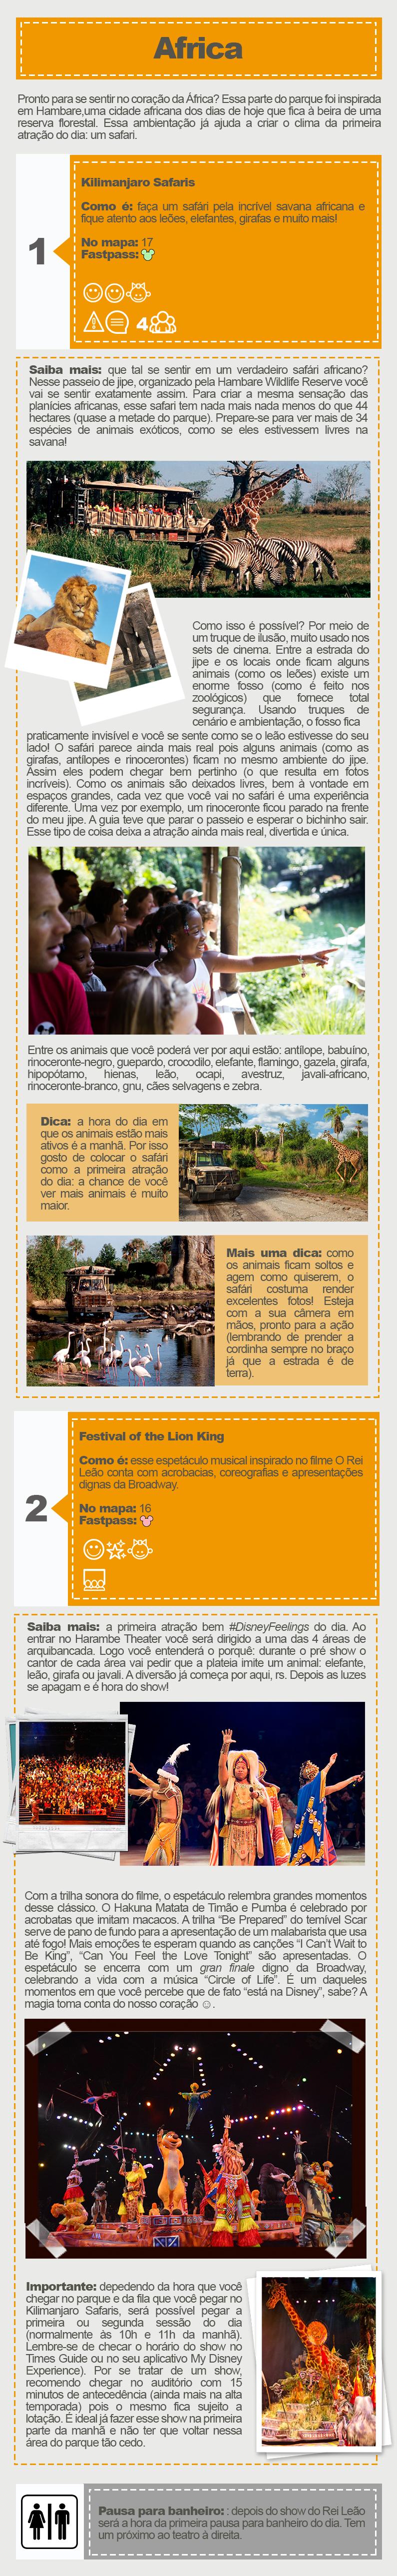 disney-animal-kingdom-atracoes-1